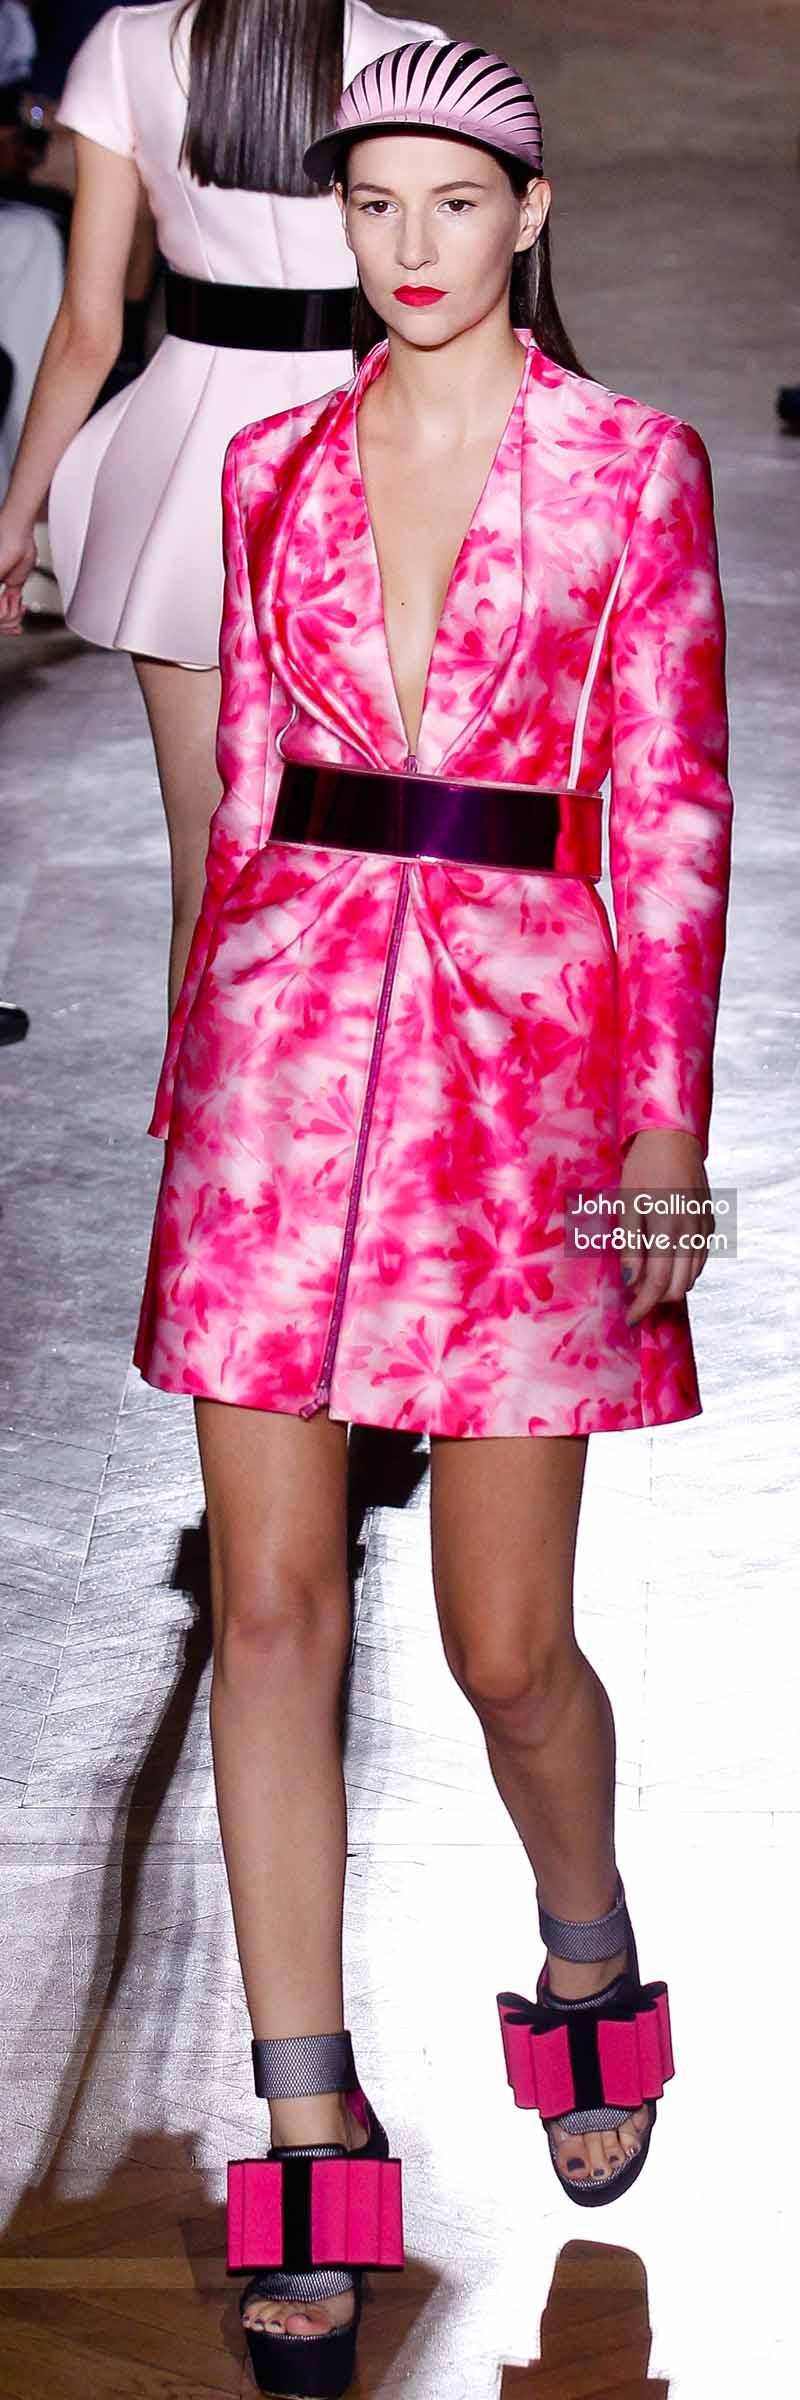 John Galliano - Amazing Hot Pink Short Coat